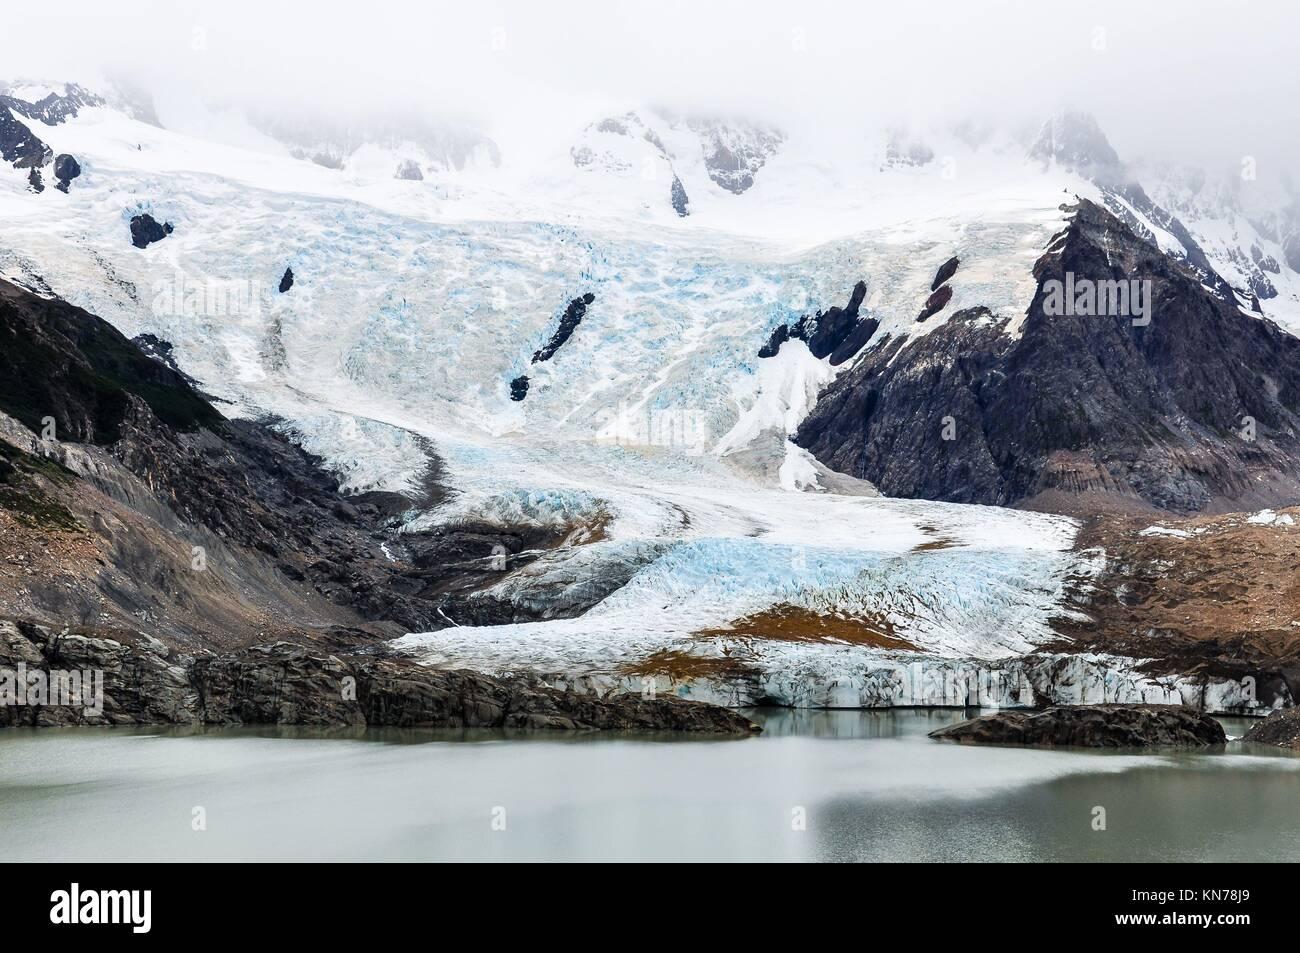 Cerro Torre Walk, El Chalten, Patagonia, Argentina. - Stock Image